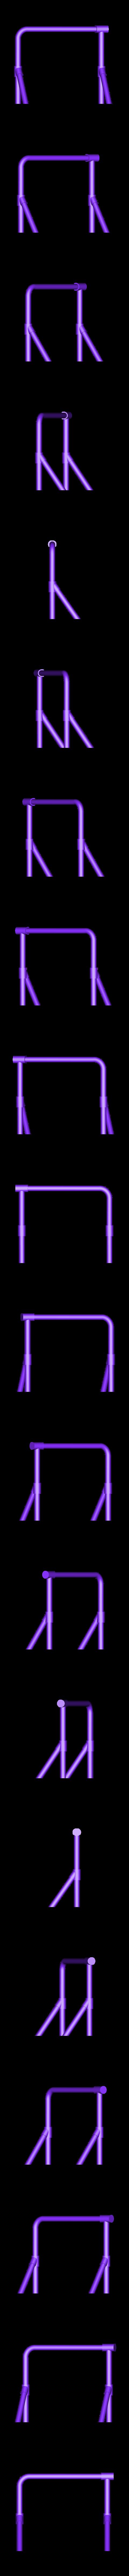 Mirror_Pilot_Railing_-B.STL Download free STL file 4-8-8-4 Big Boy Locomotive • 3D printer object, RaymondDeLuca